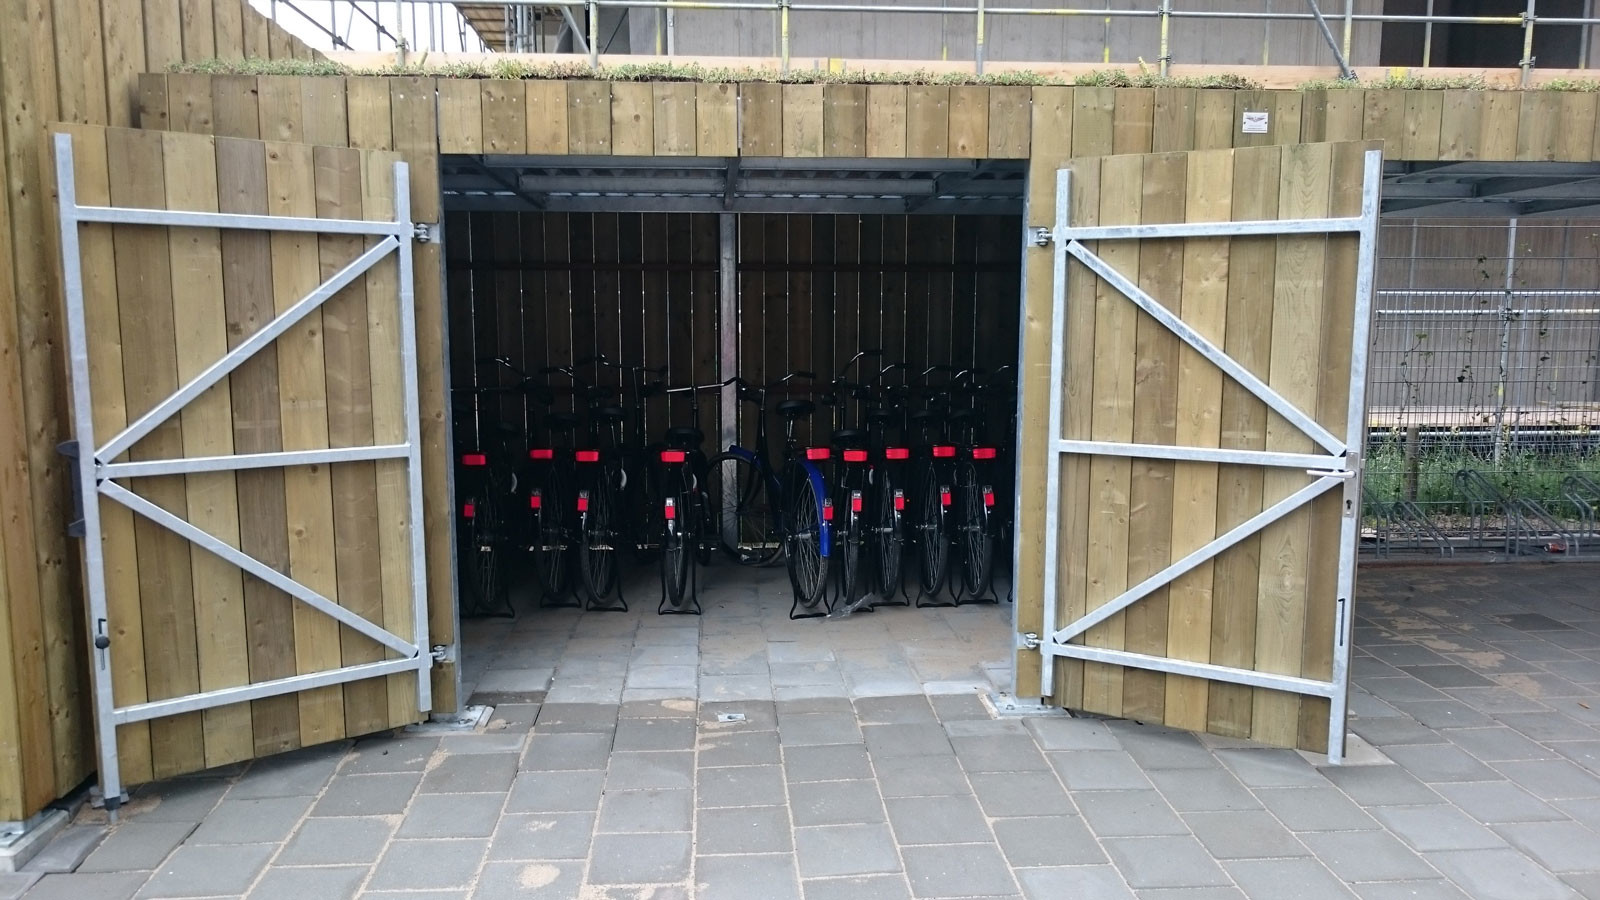 fietsenstalling-vurenhout-02